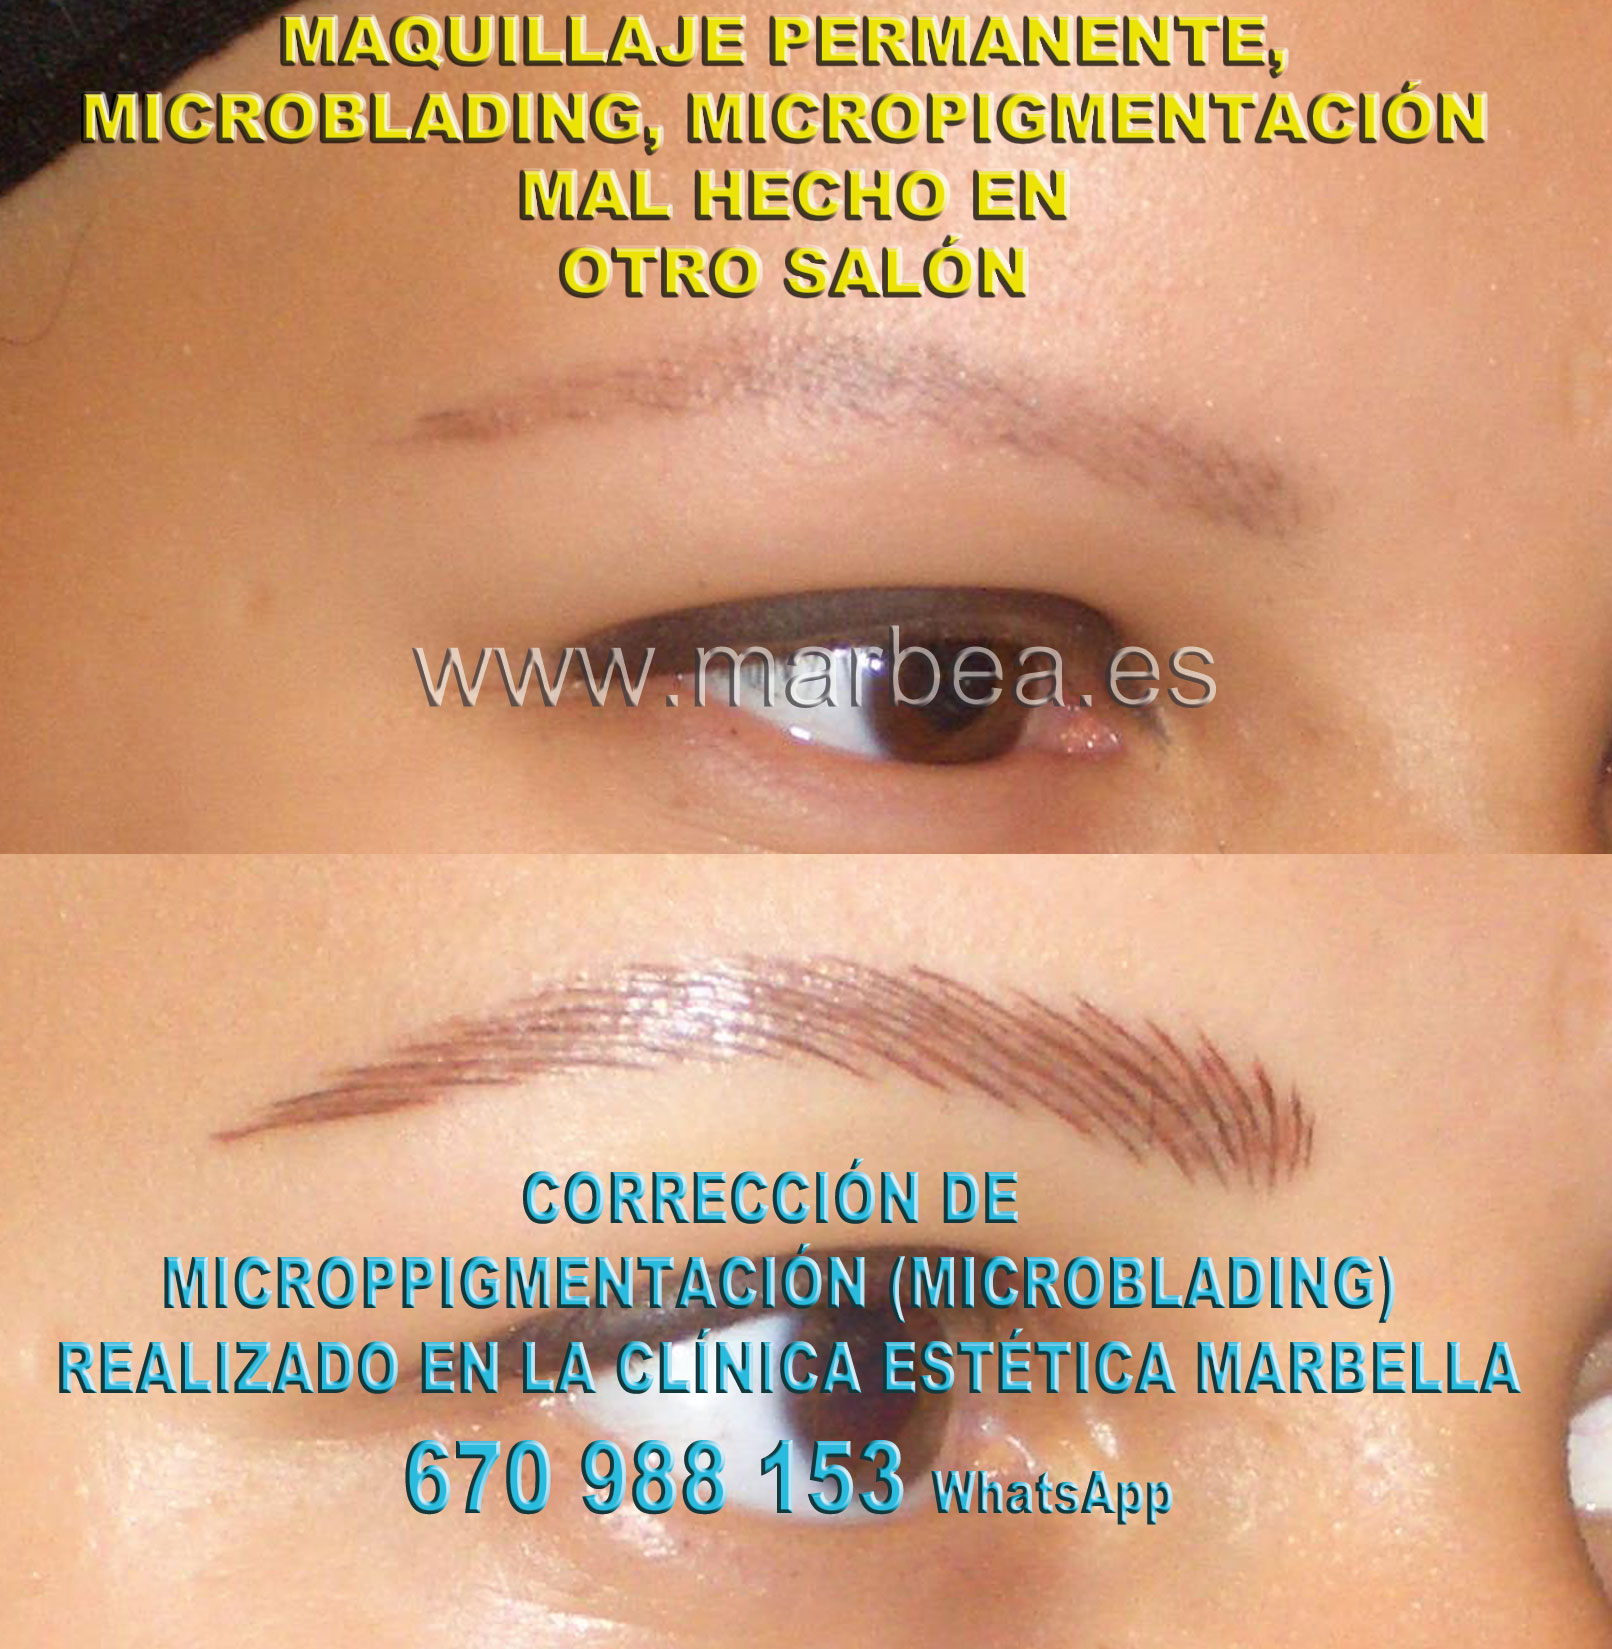 MAQUILLAJE PERMANENTE CEJAS MAL HECHO clínica estética maquillaje permanete ofrenda corrección de micropigmentación en cejas,micropigmentación correctiva cejas mal hecha